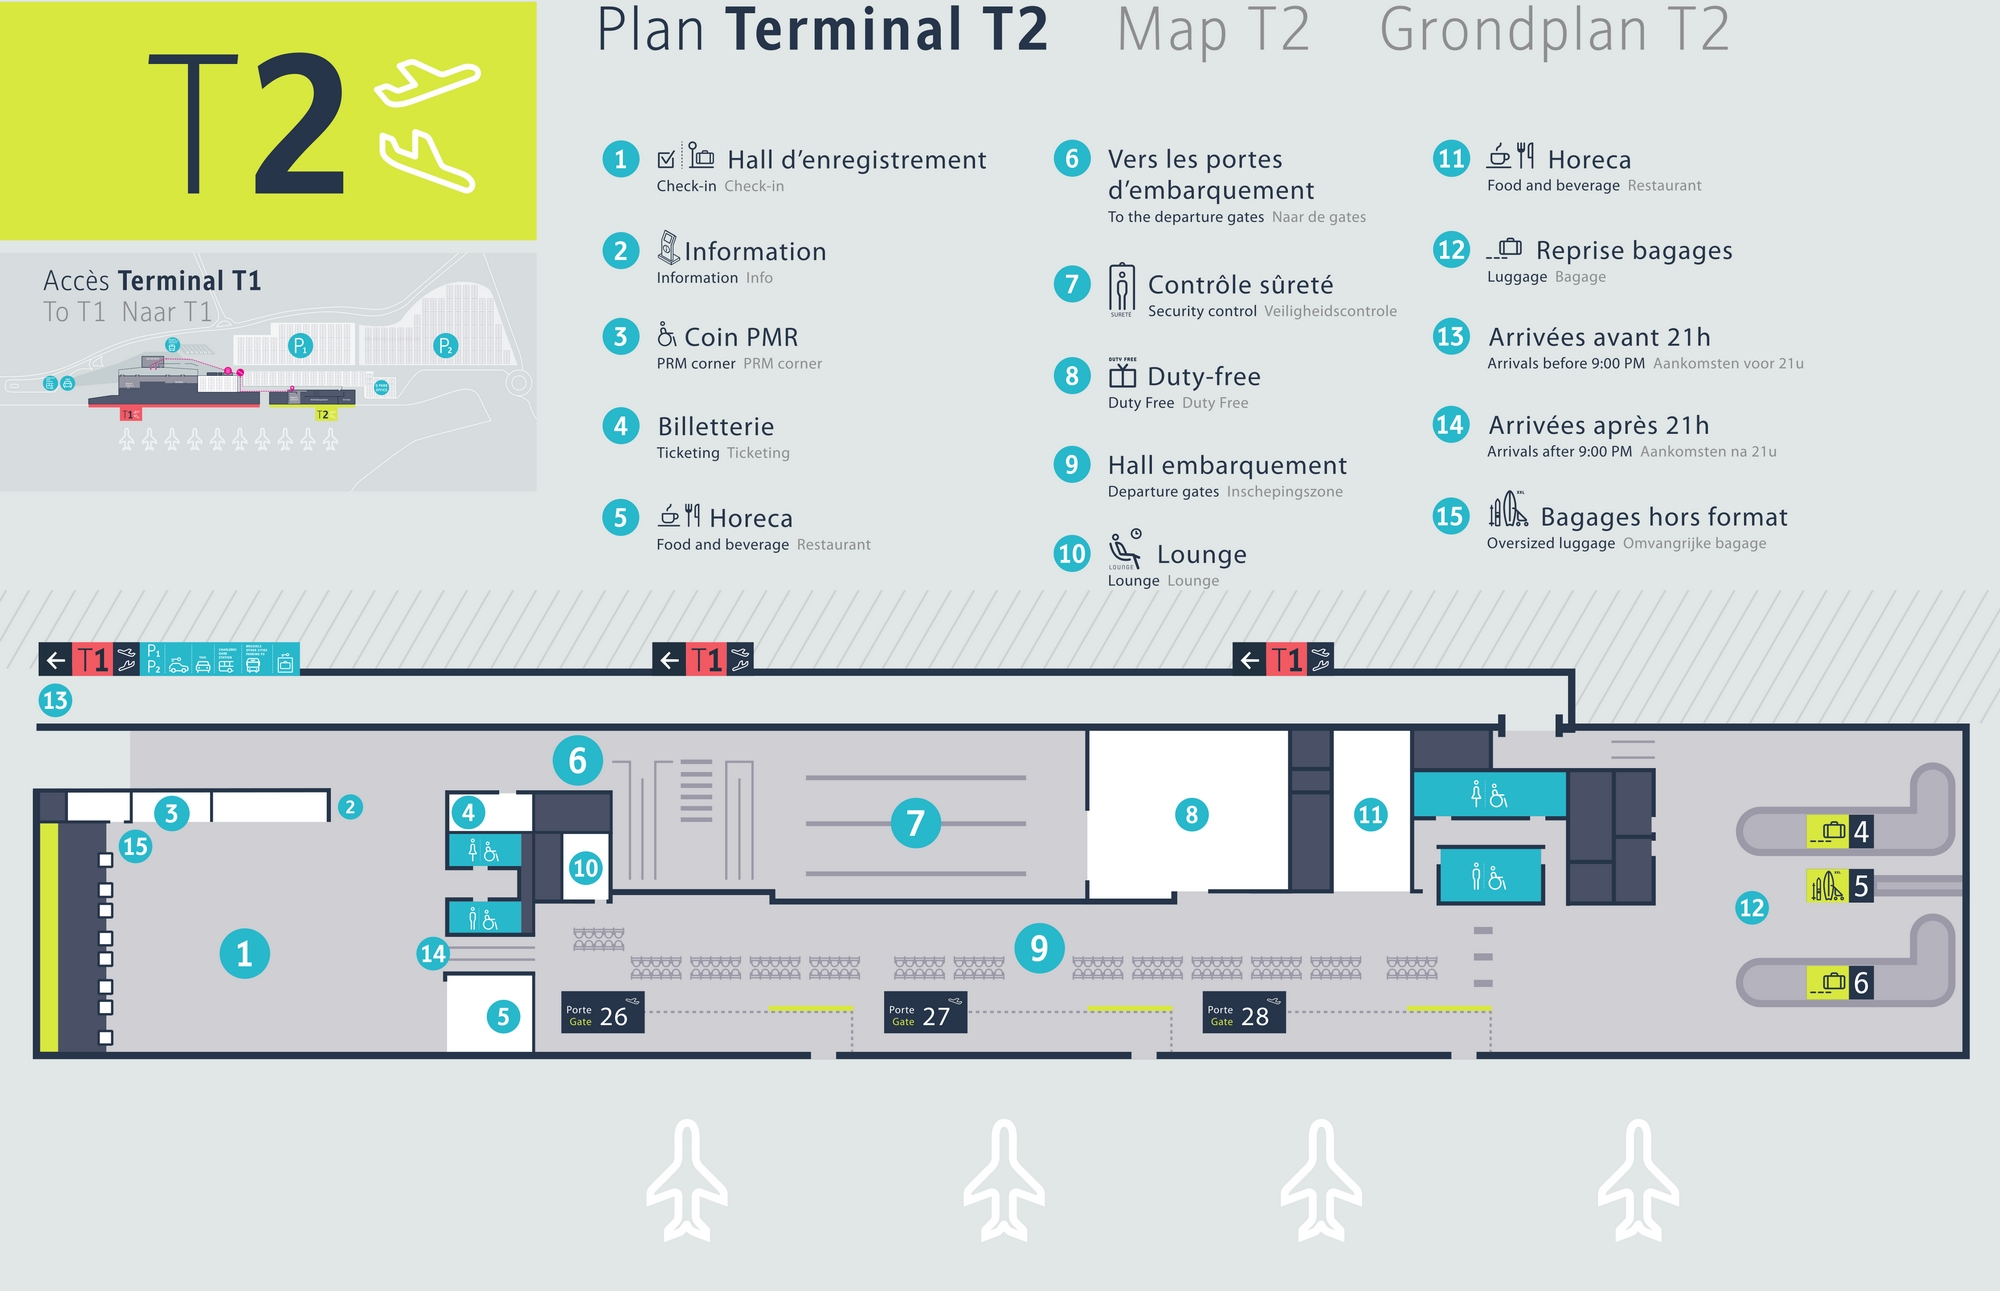 Схема терминалов аэропорта Шарлеруа: Т2